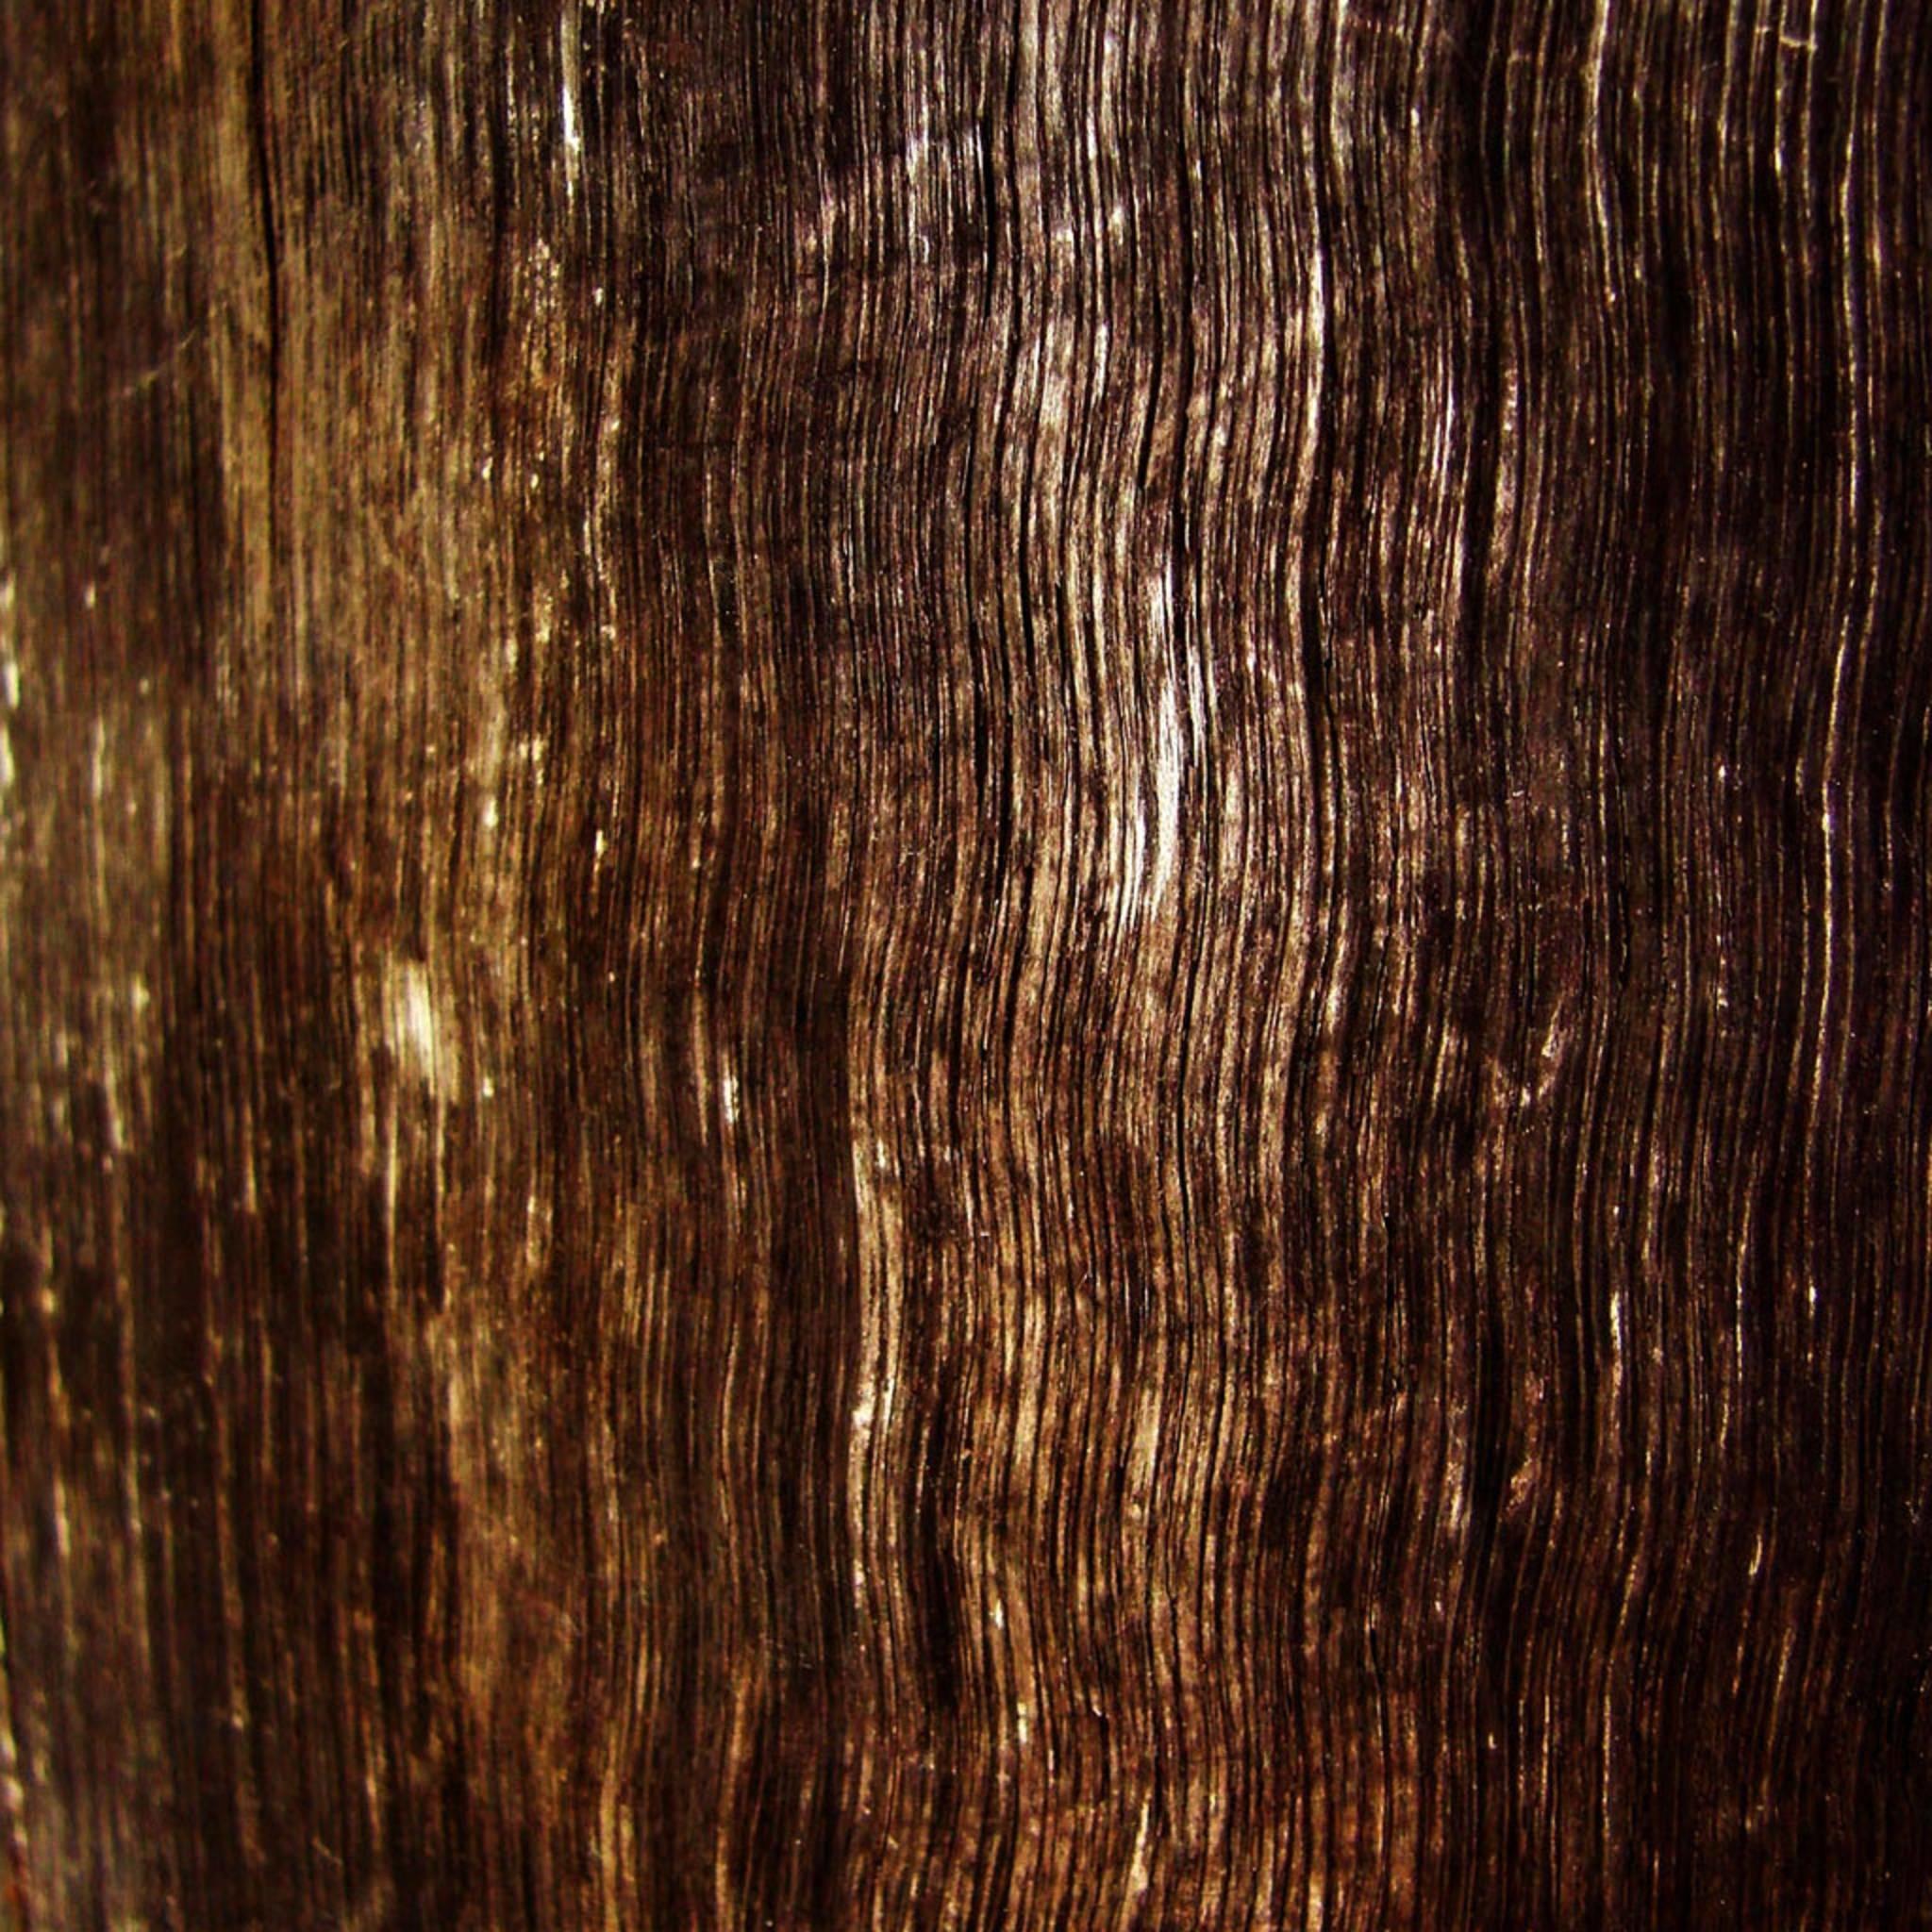 Wallpapers For > Wood Grain Wallpaper Hd